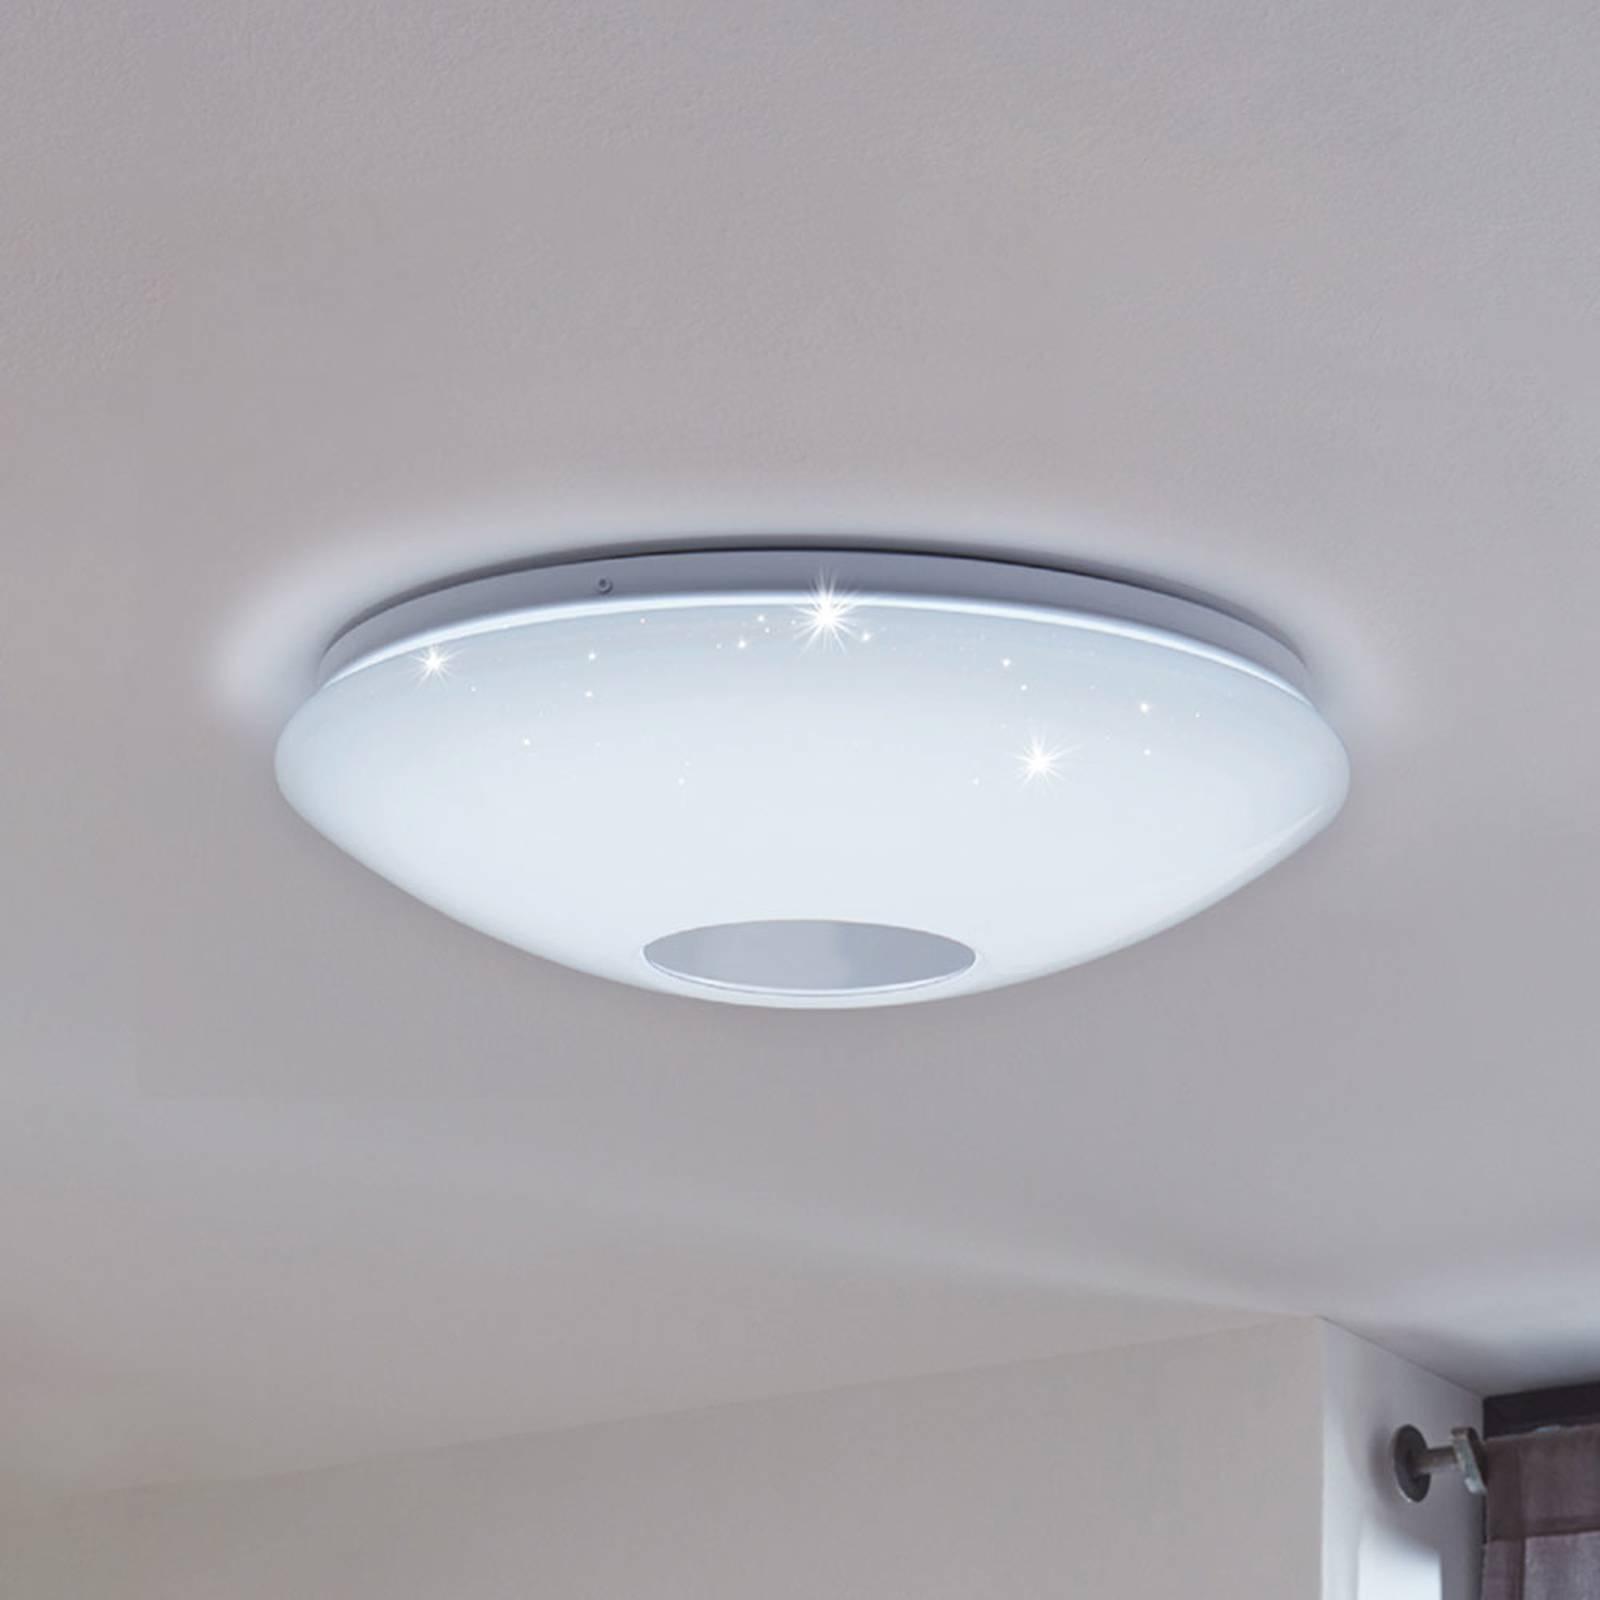 Plafoniera LED EGLO connect Voltago-C tonda bianca